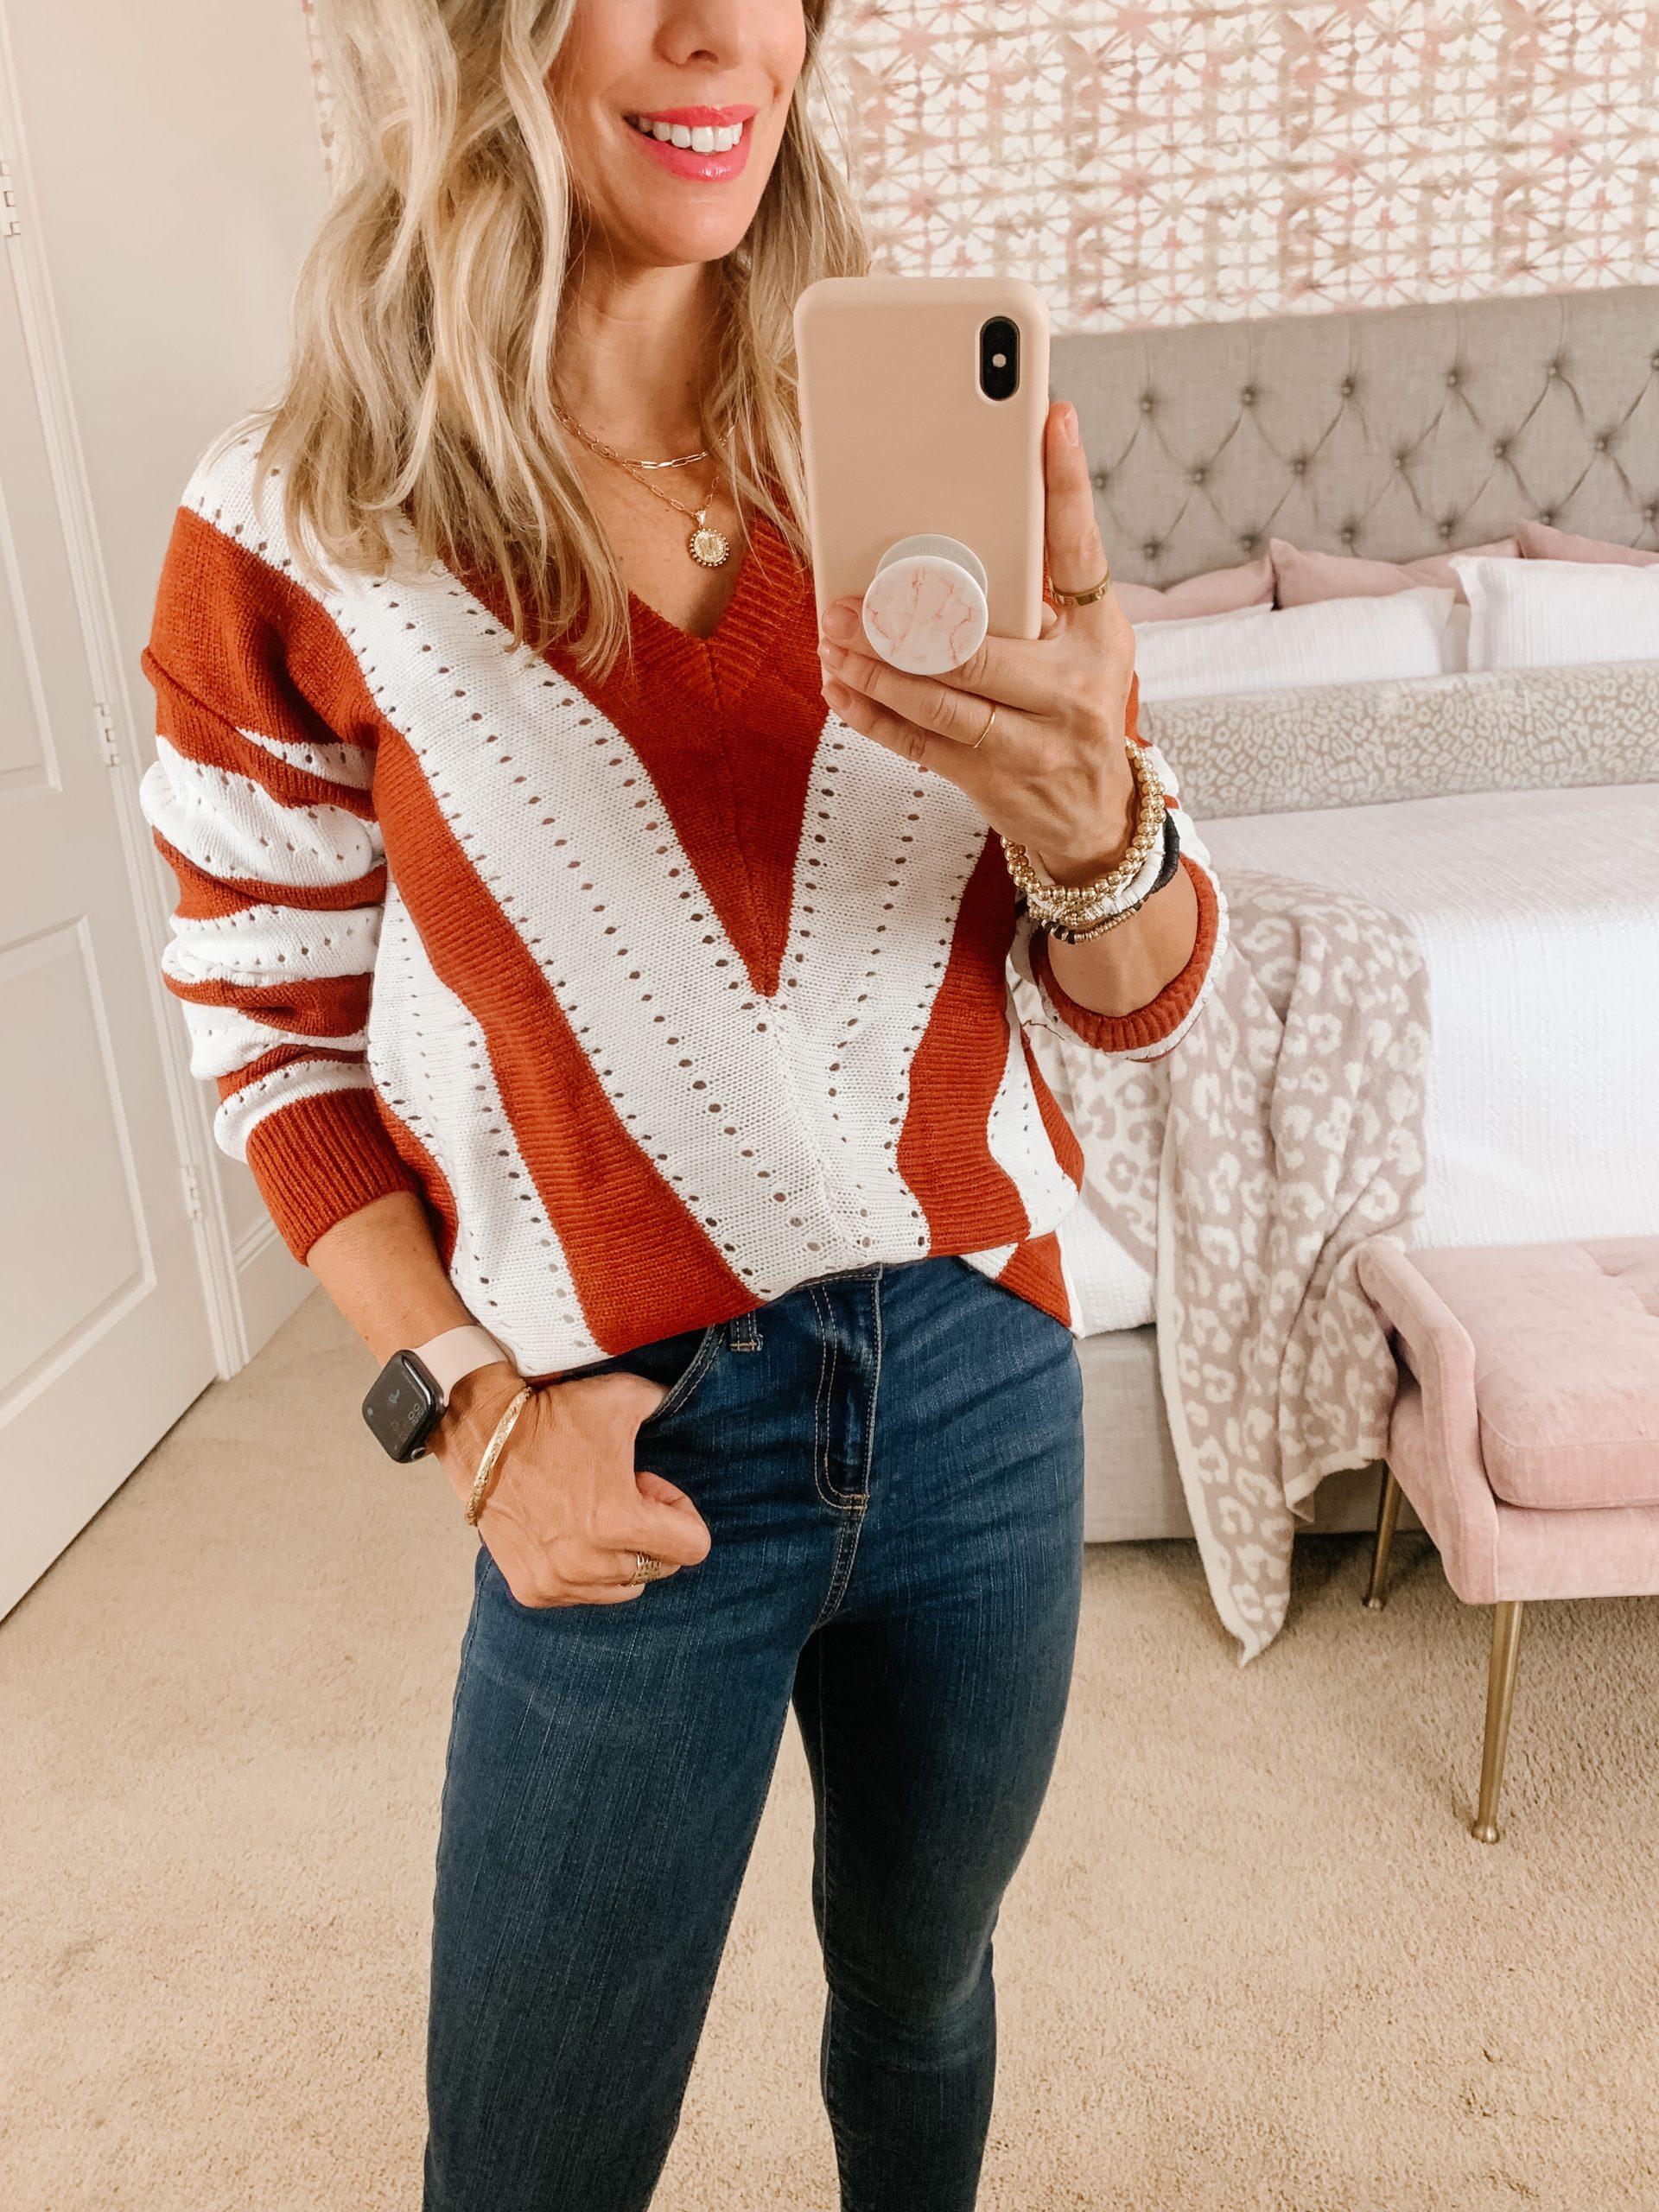 Amazon women's v-neck sweater